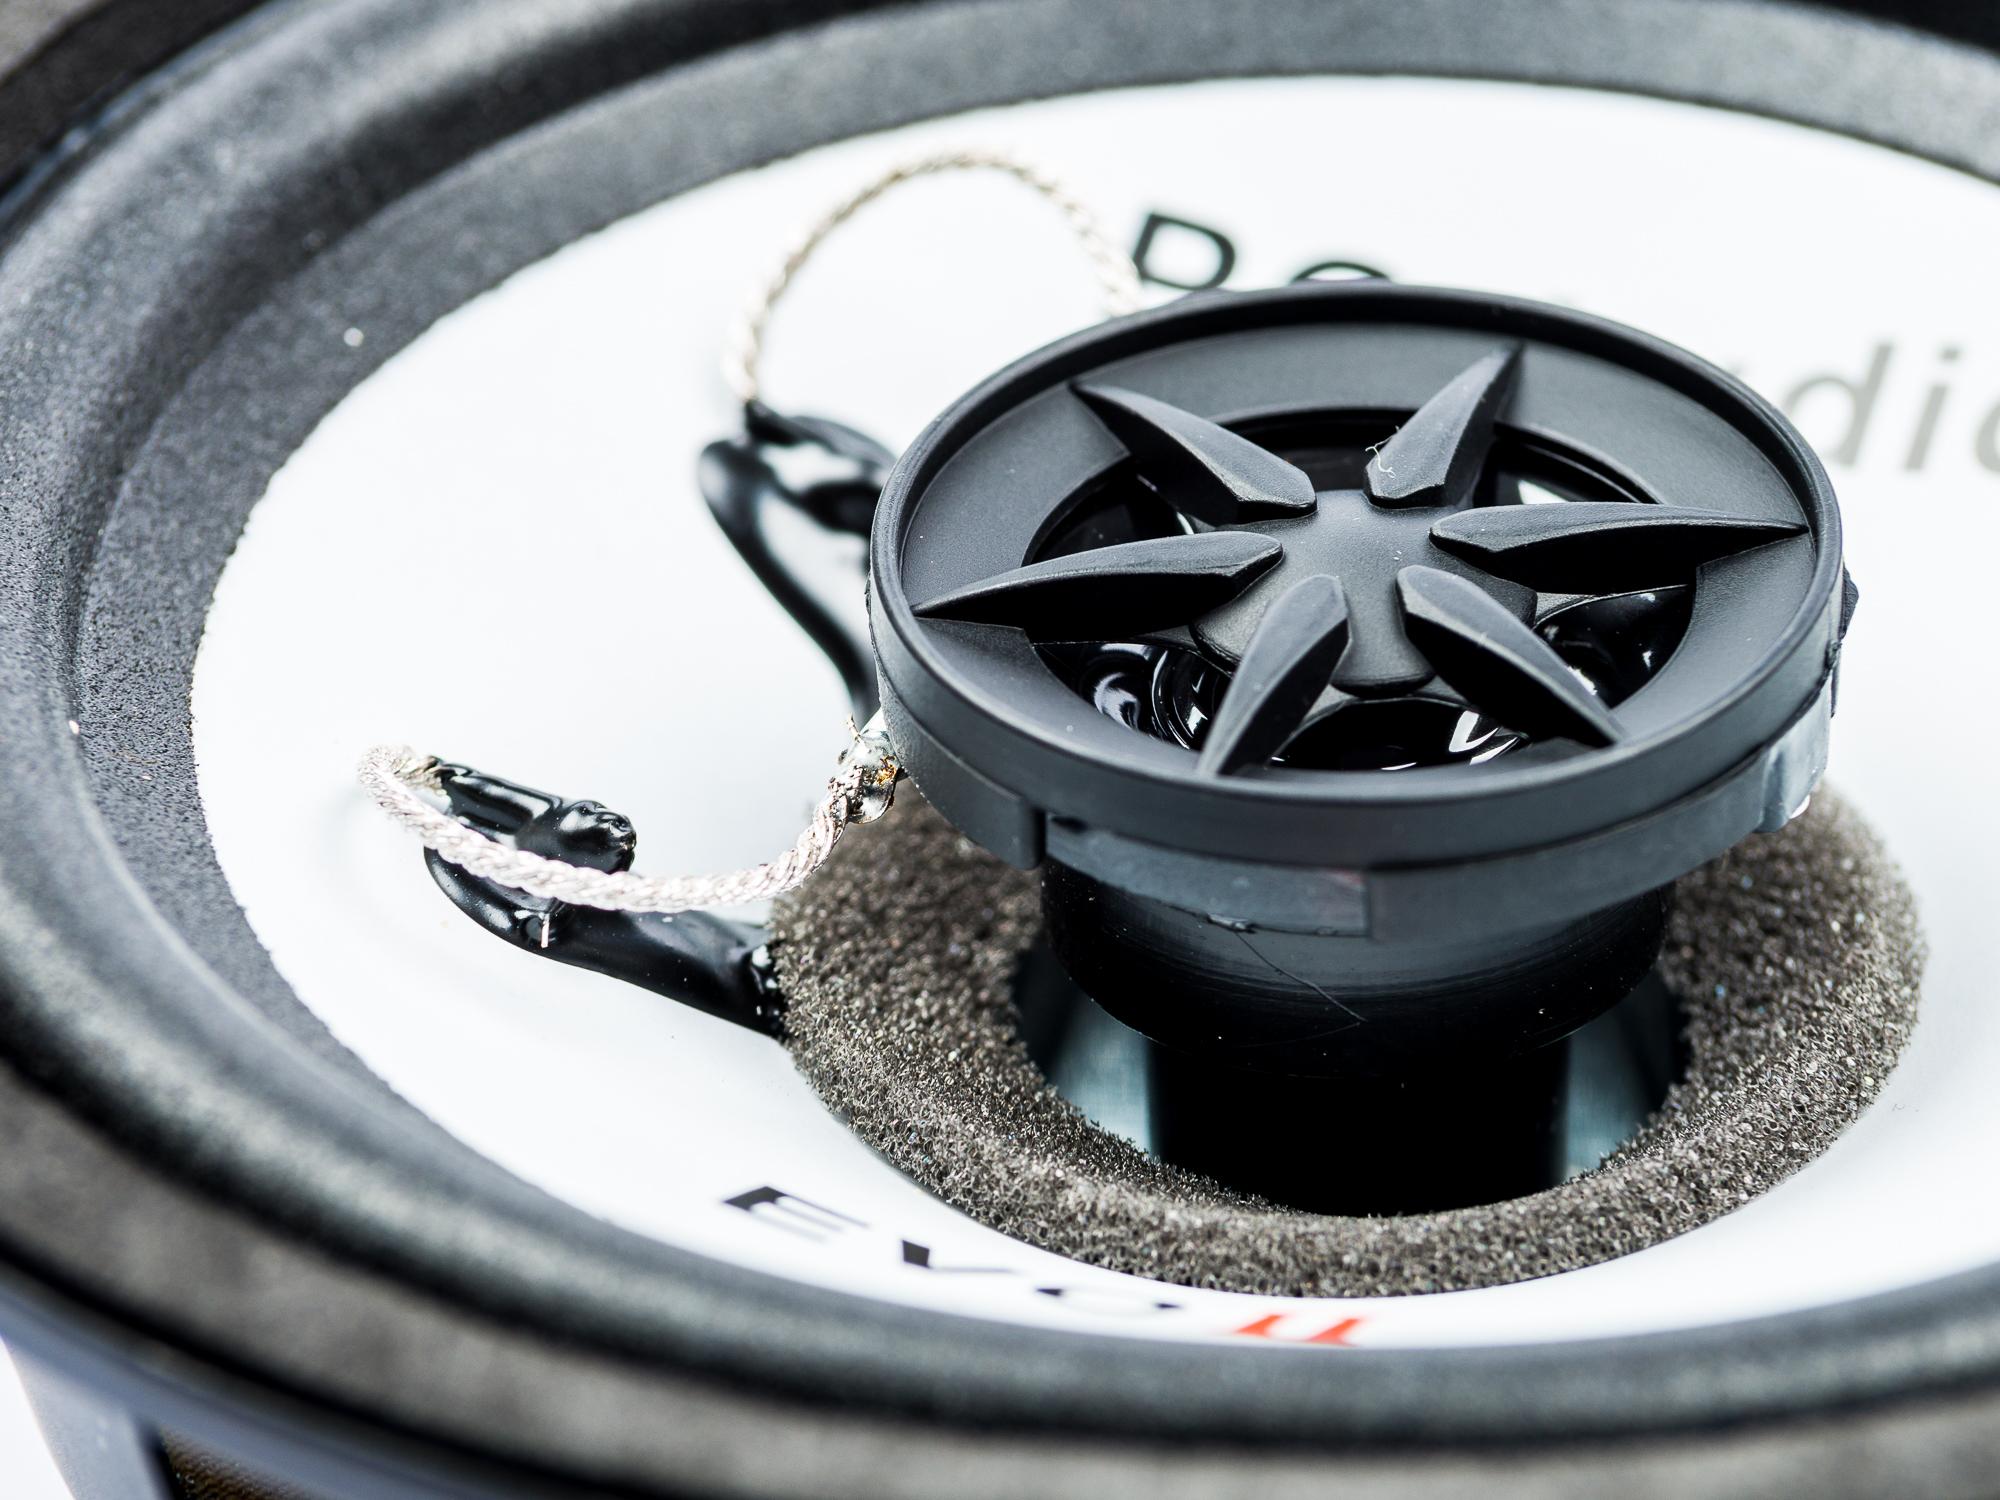 Audi TT 8N A6 C5 A3 8L A4 B5 A6 Avant Lautsprecher Einbauset Tür vorne, PG Audio – Bild 4